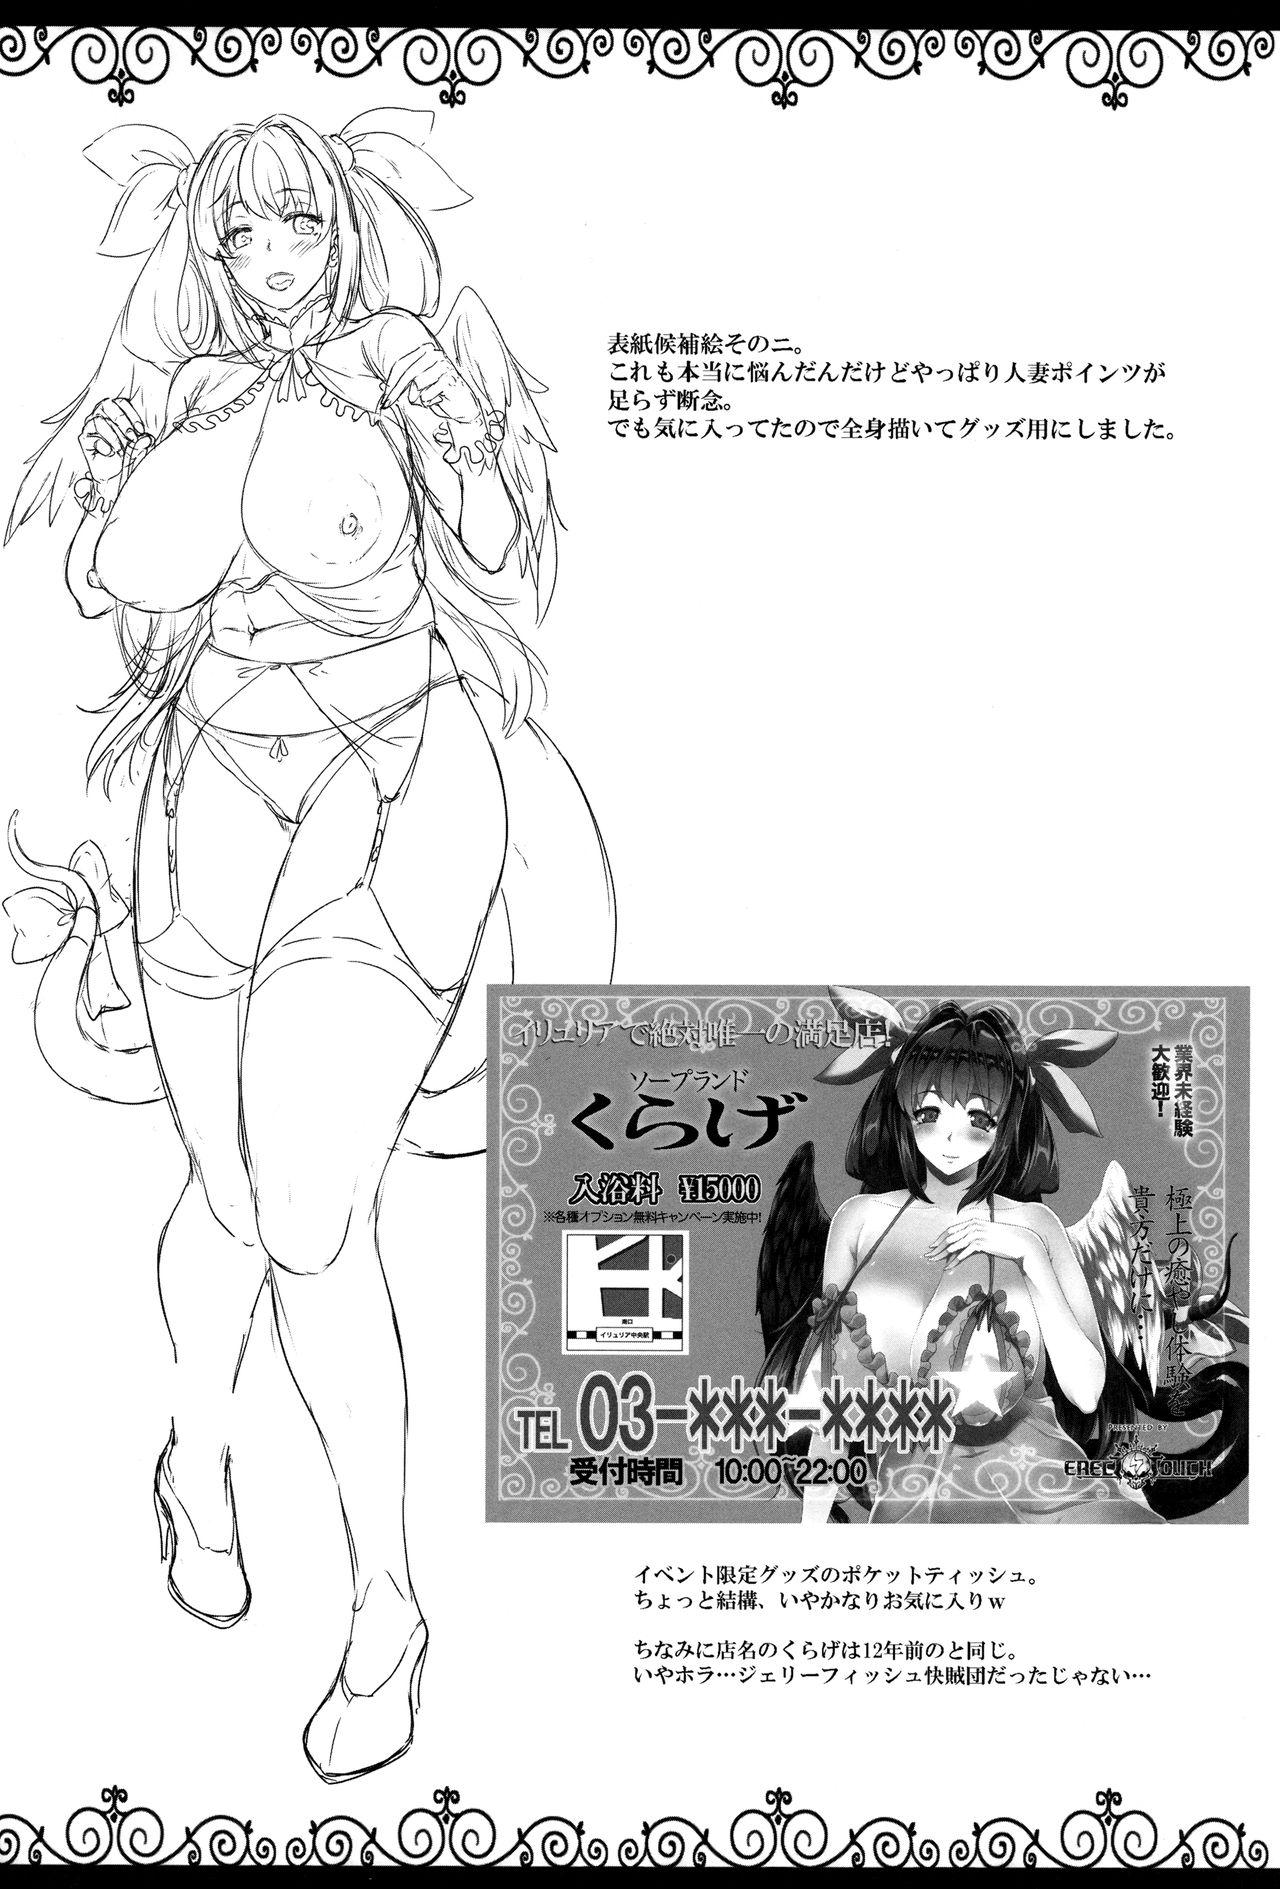 (C91) [ERECT TOUCH (Erect Sawaru)] Osanazuma Bakunyuu Nurunuru Soap-jou | Big-Breasted Soapy Massage Giving Young Wife (Guilty Gear)  [English] {darknight} 26